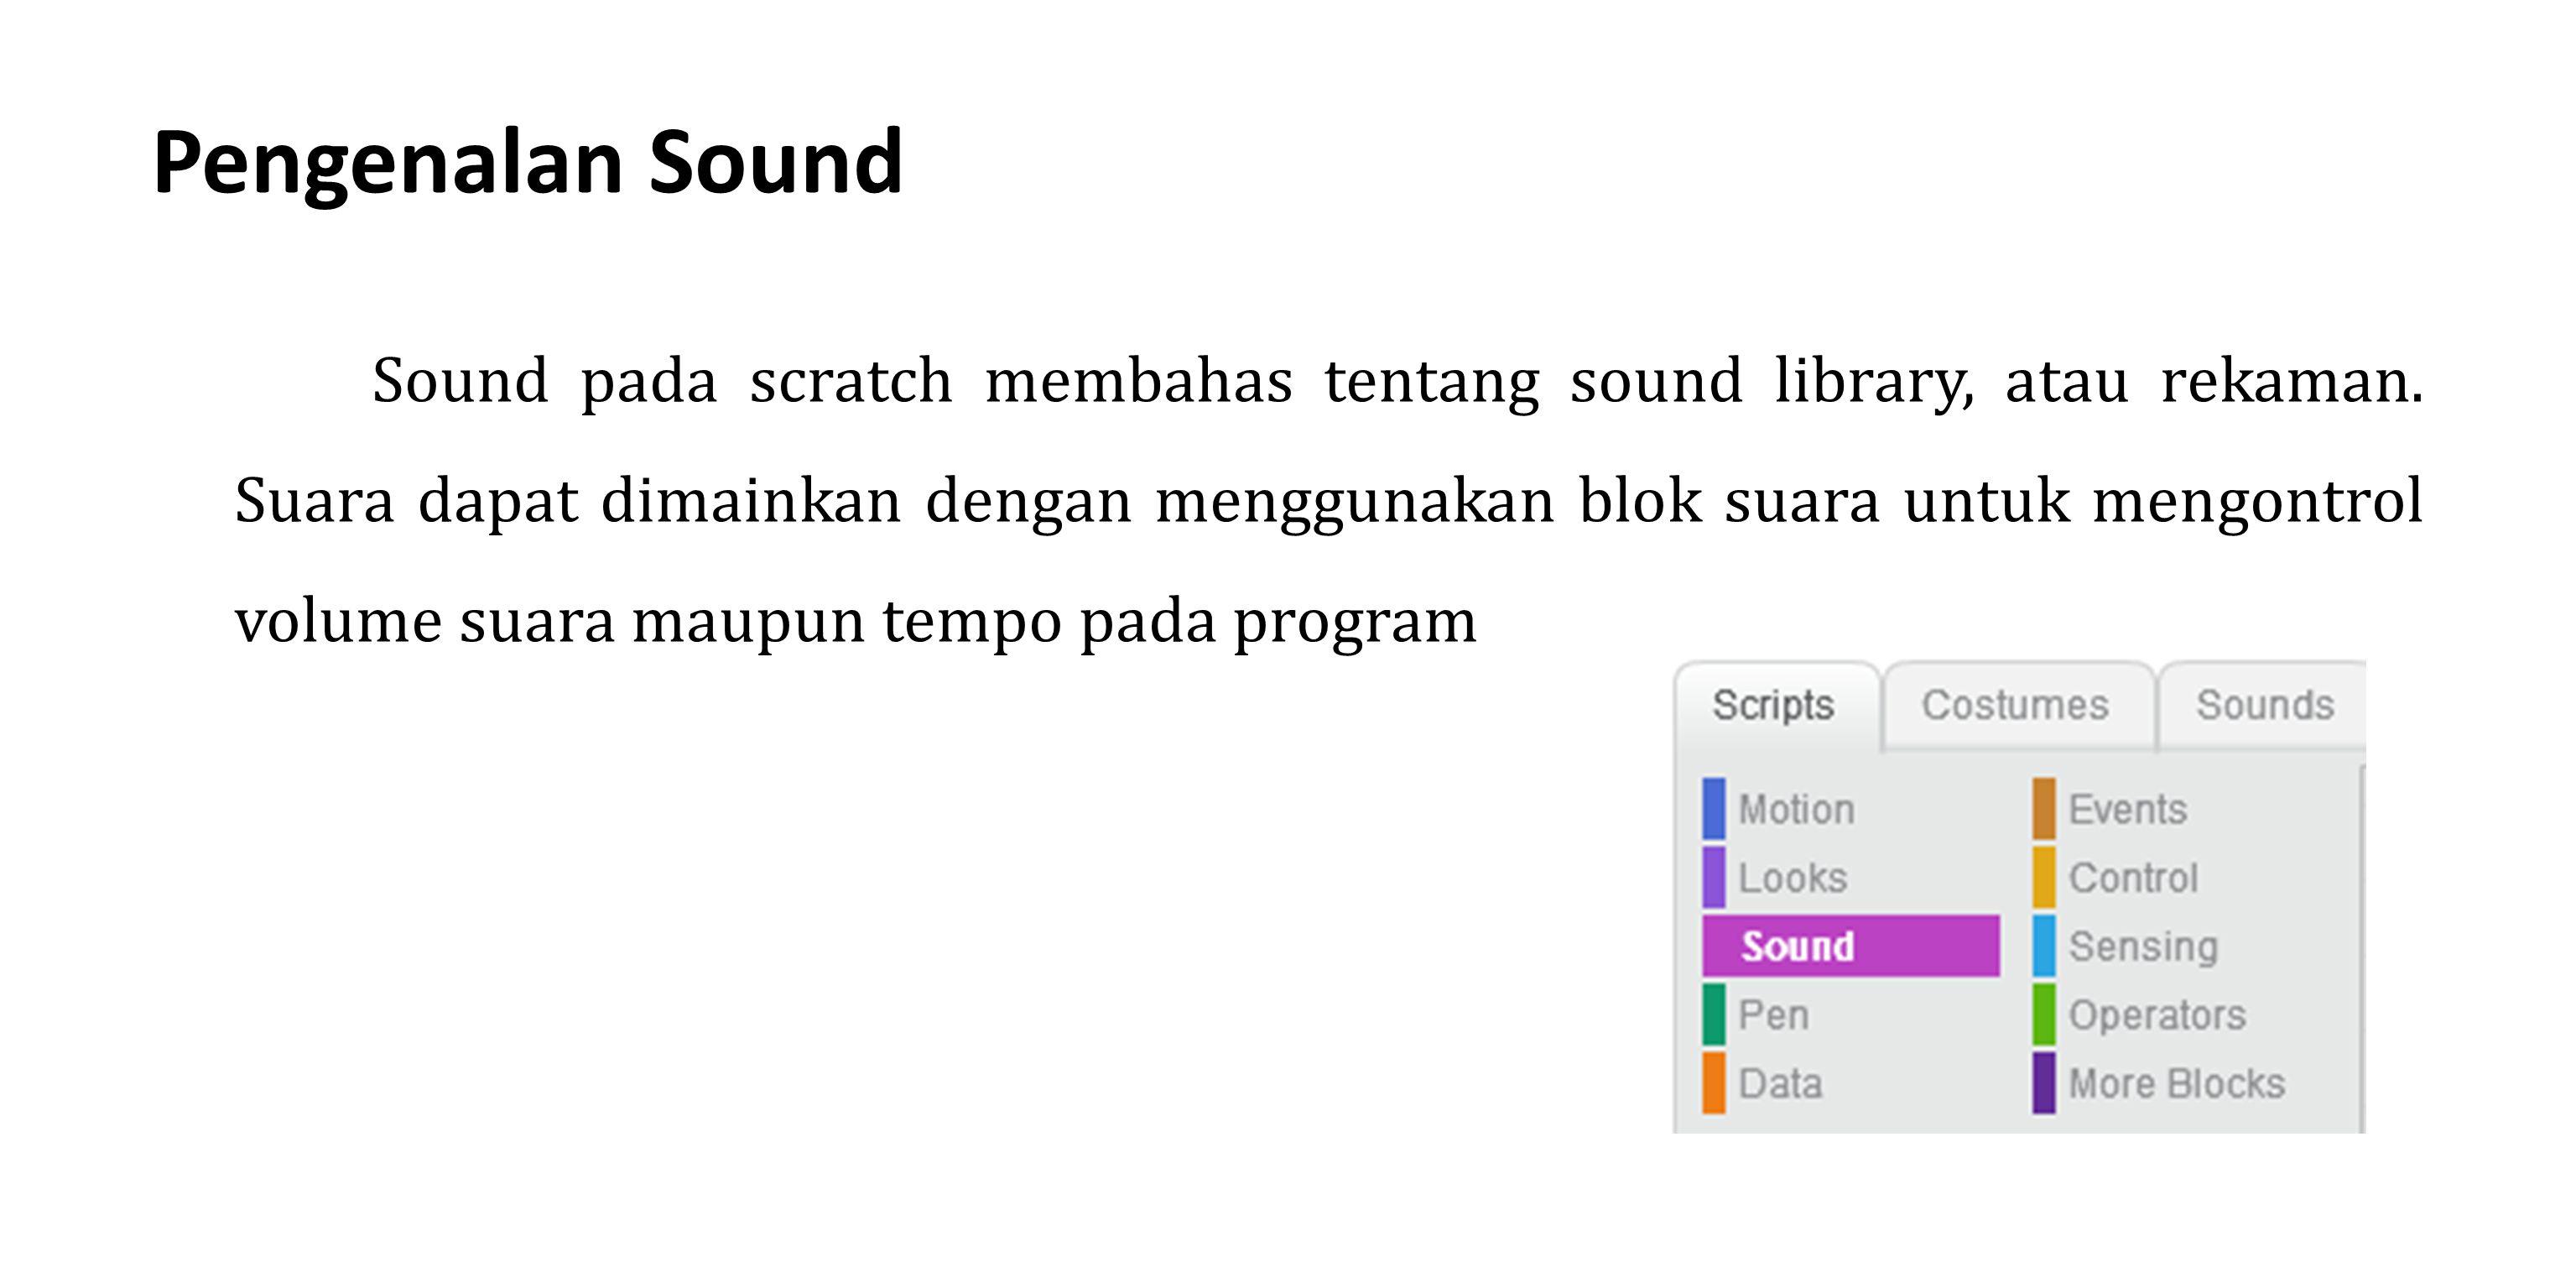 Pengenalan Sound